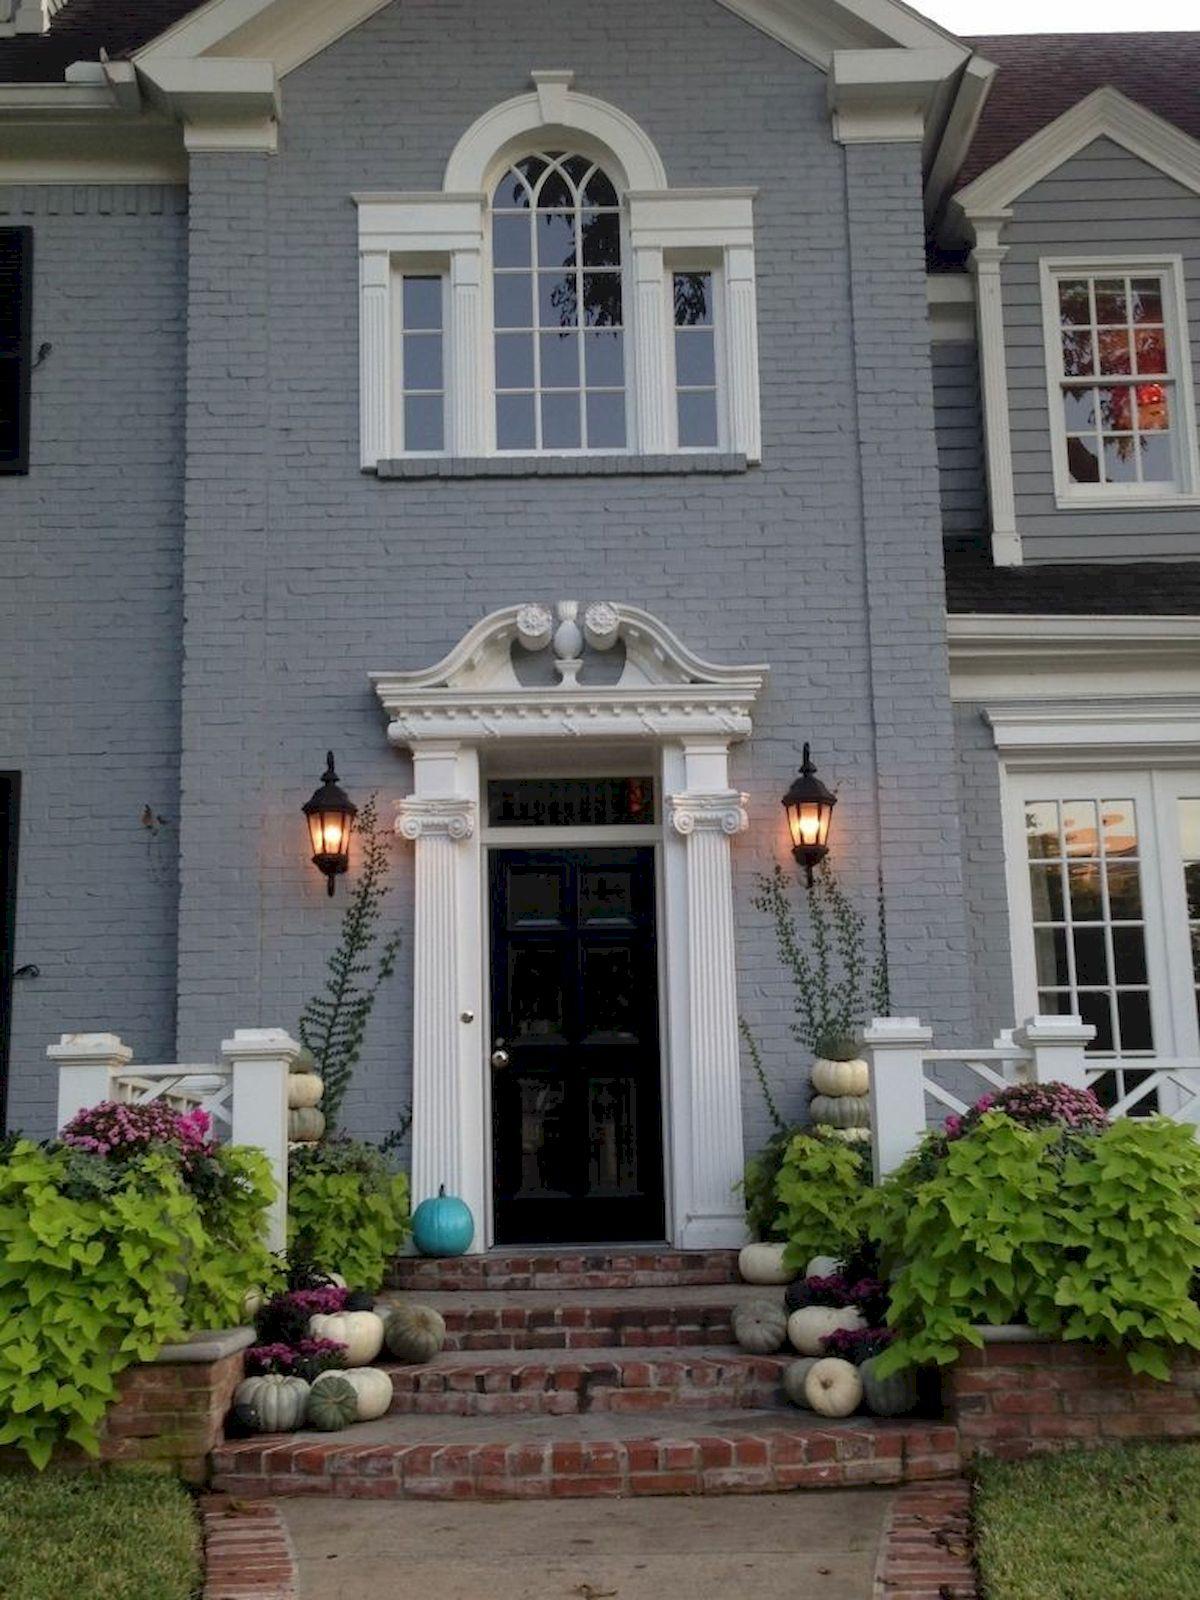 70 Stunning Exterior House Design Ideas (45)